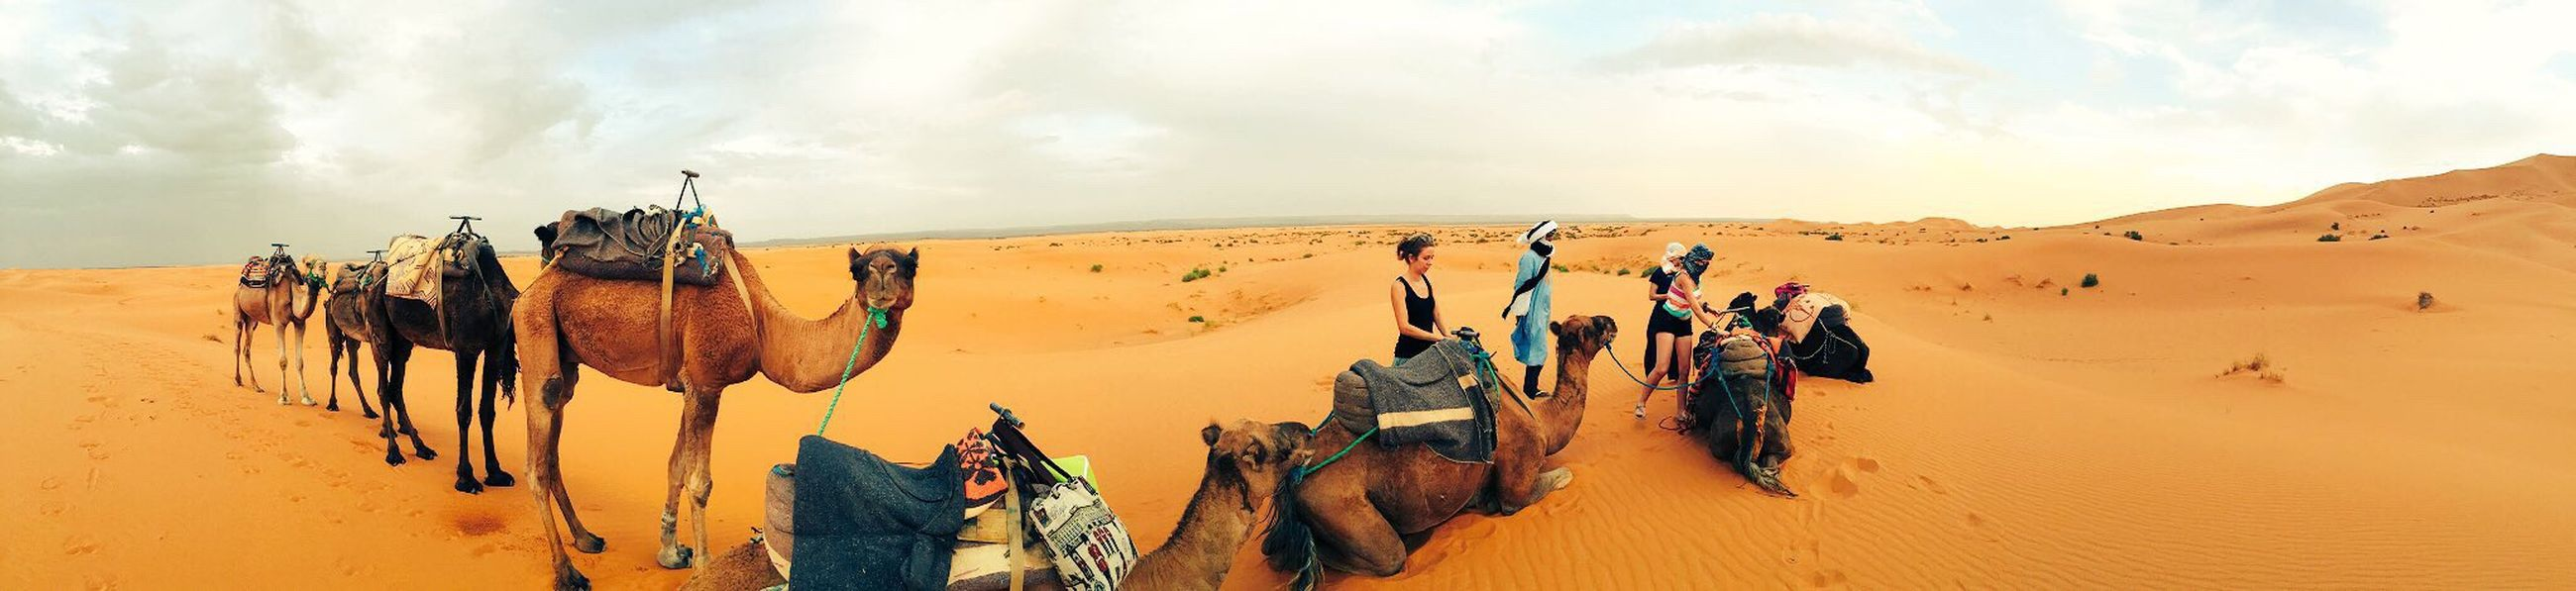 Morocco Saharadesert Sand Sahara Sand Sahara Sahara Desert Merzougadeserts Merzouga Panorama Nature Camel Camels Camel Riding Desert